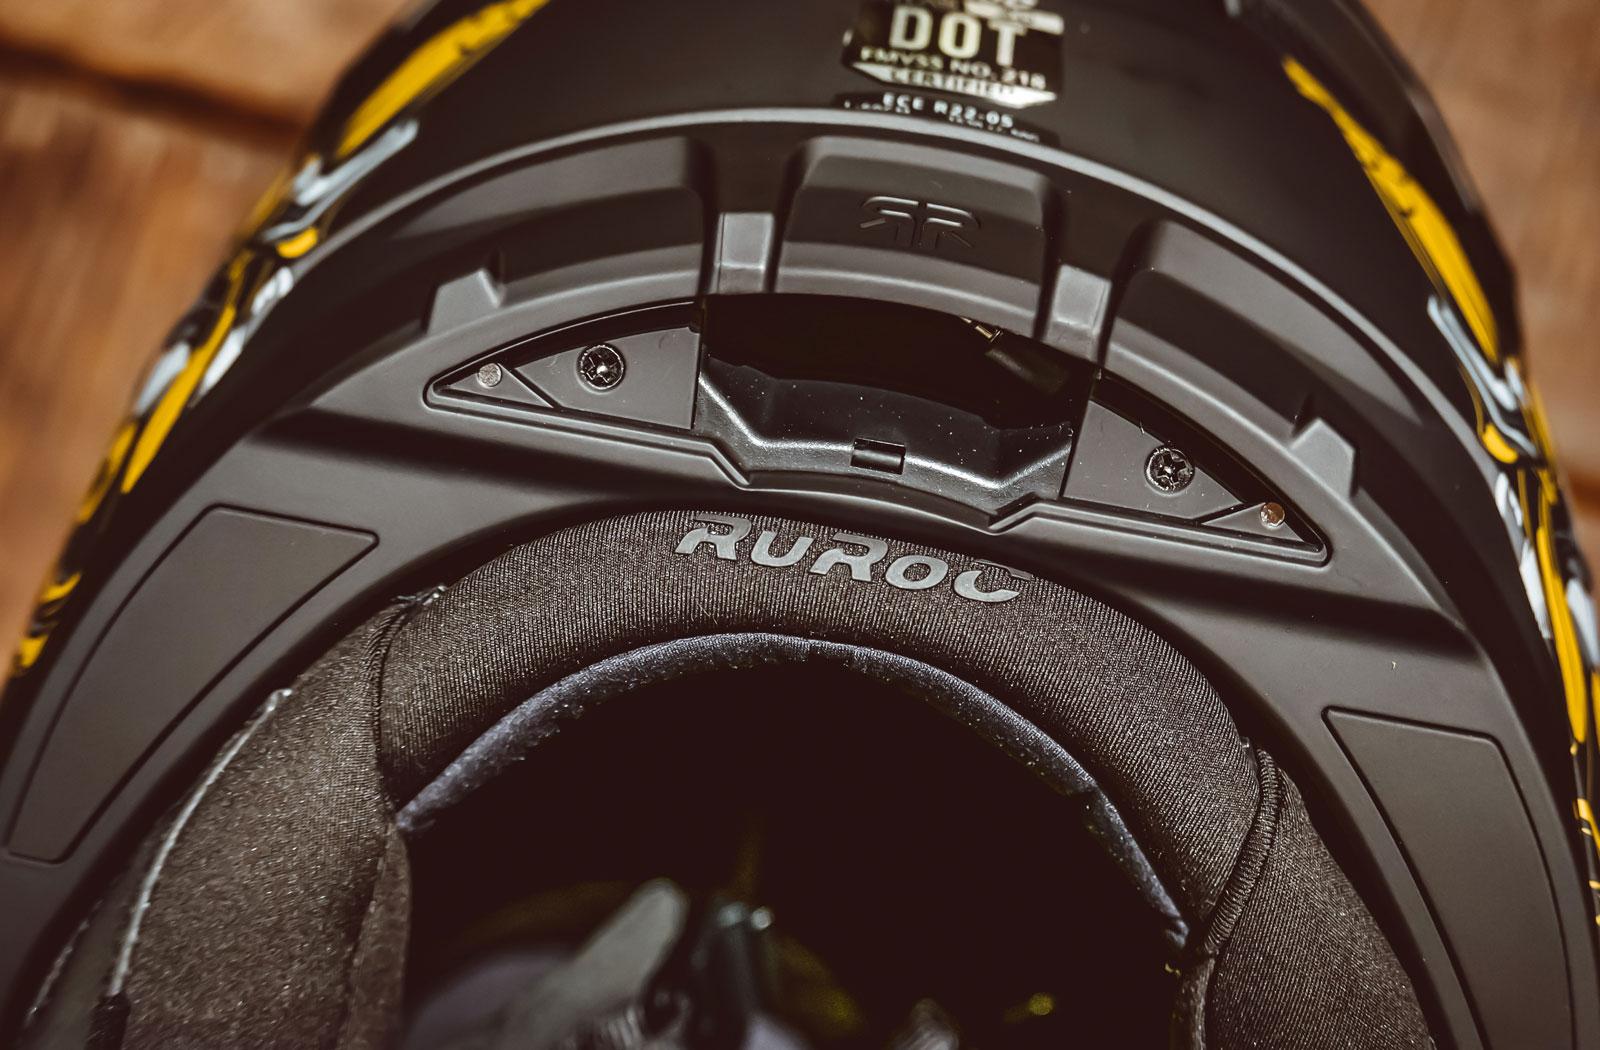 Ruroc Atlas 3 review